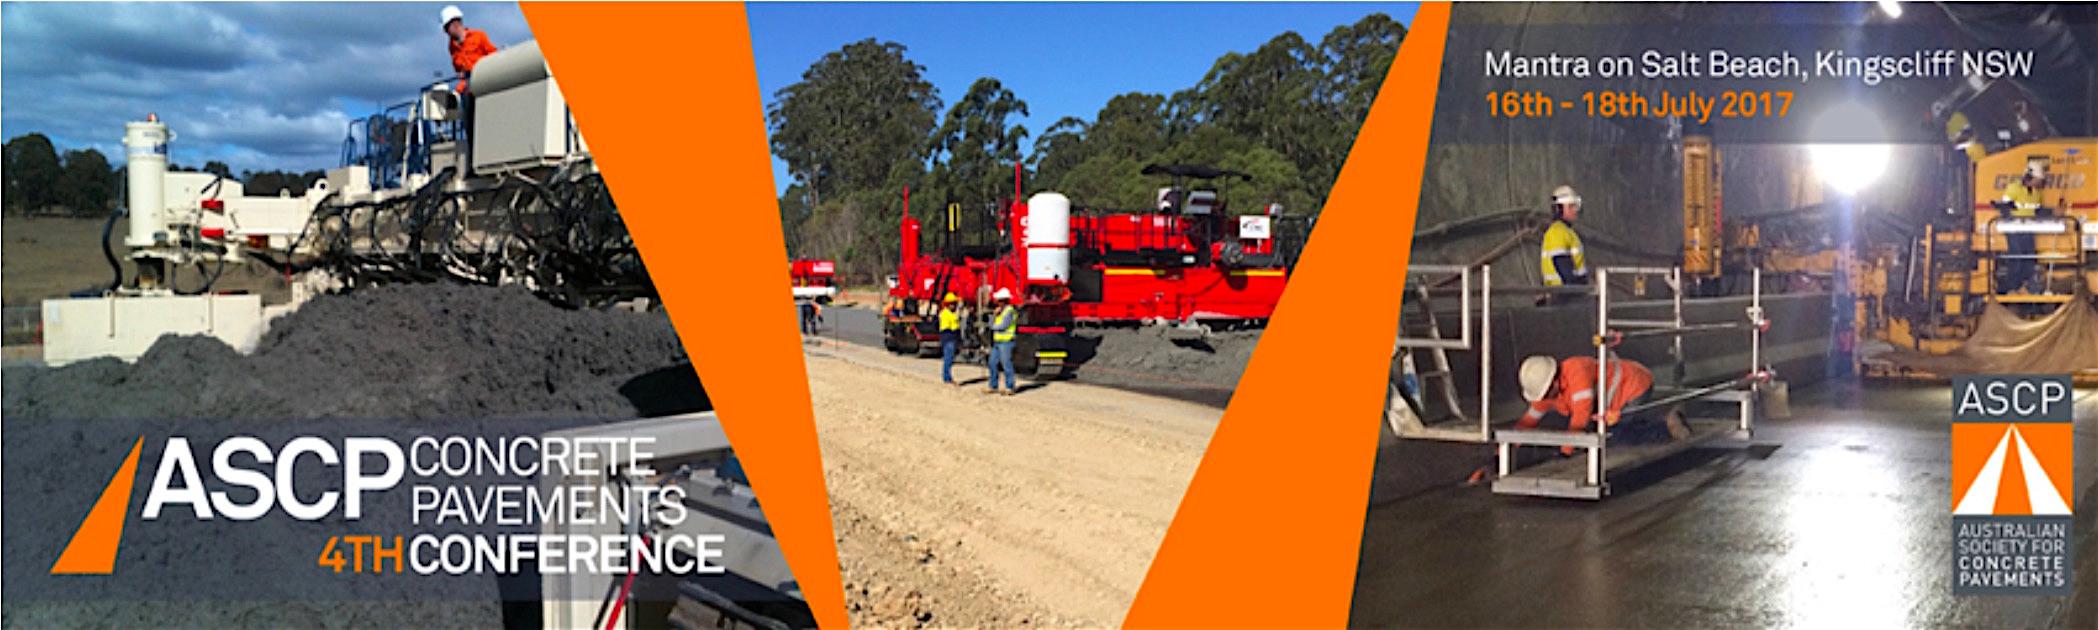 Australia: ASCP 4th Concrete Pavements Conference 2017 Update